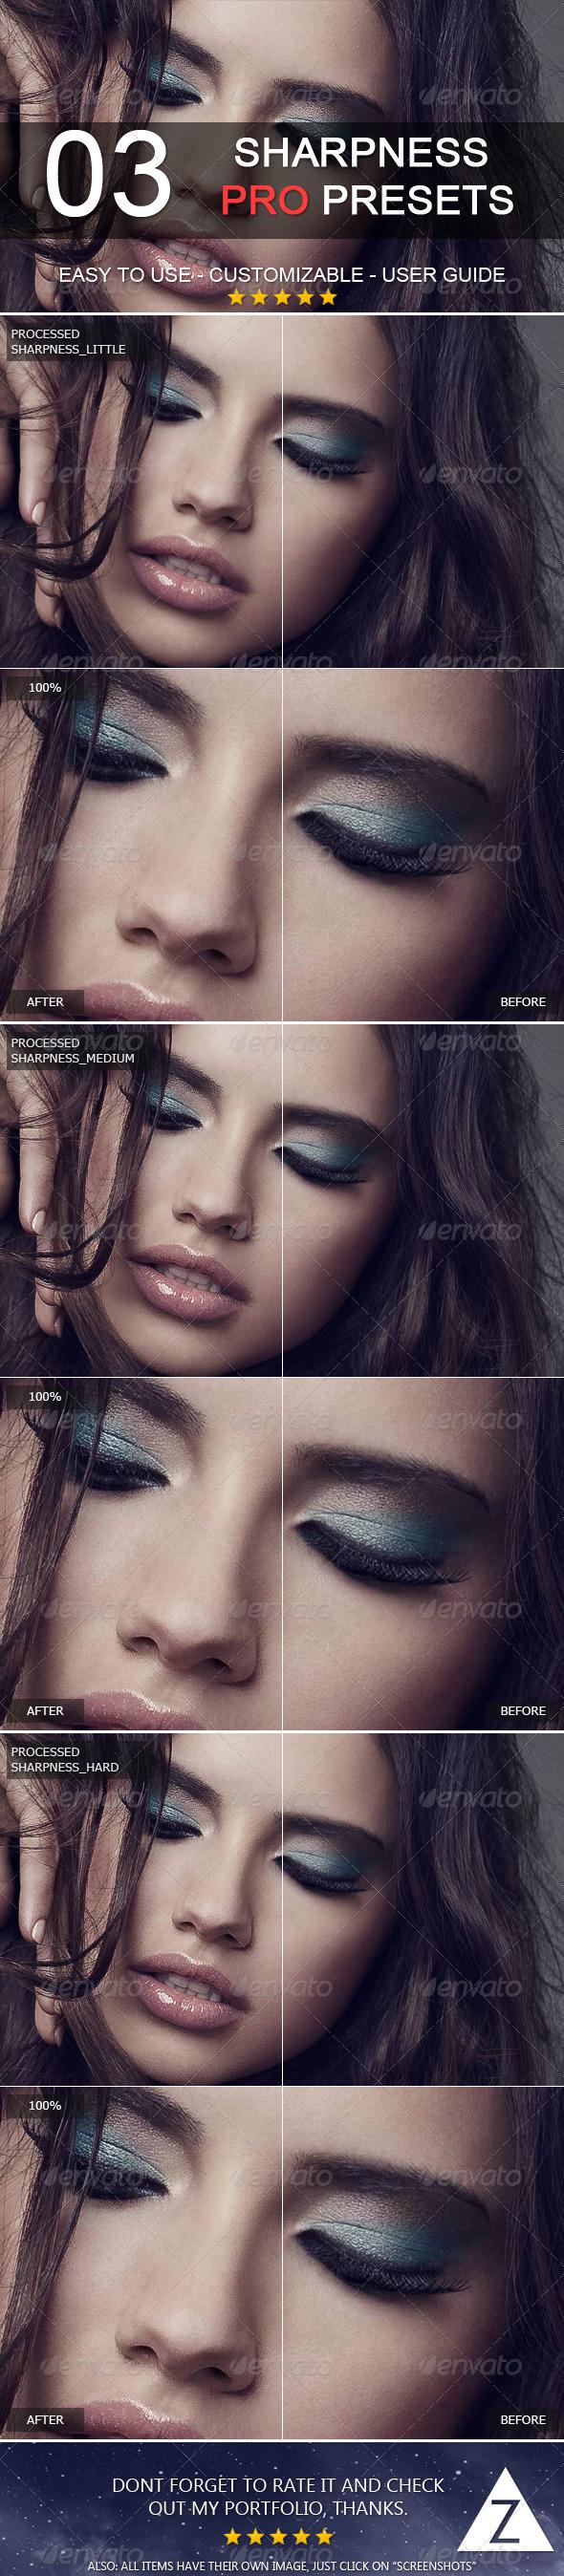 GraphicRiver 3 Pro Sharpness Presets 6371402